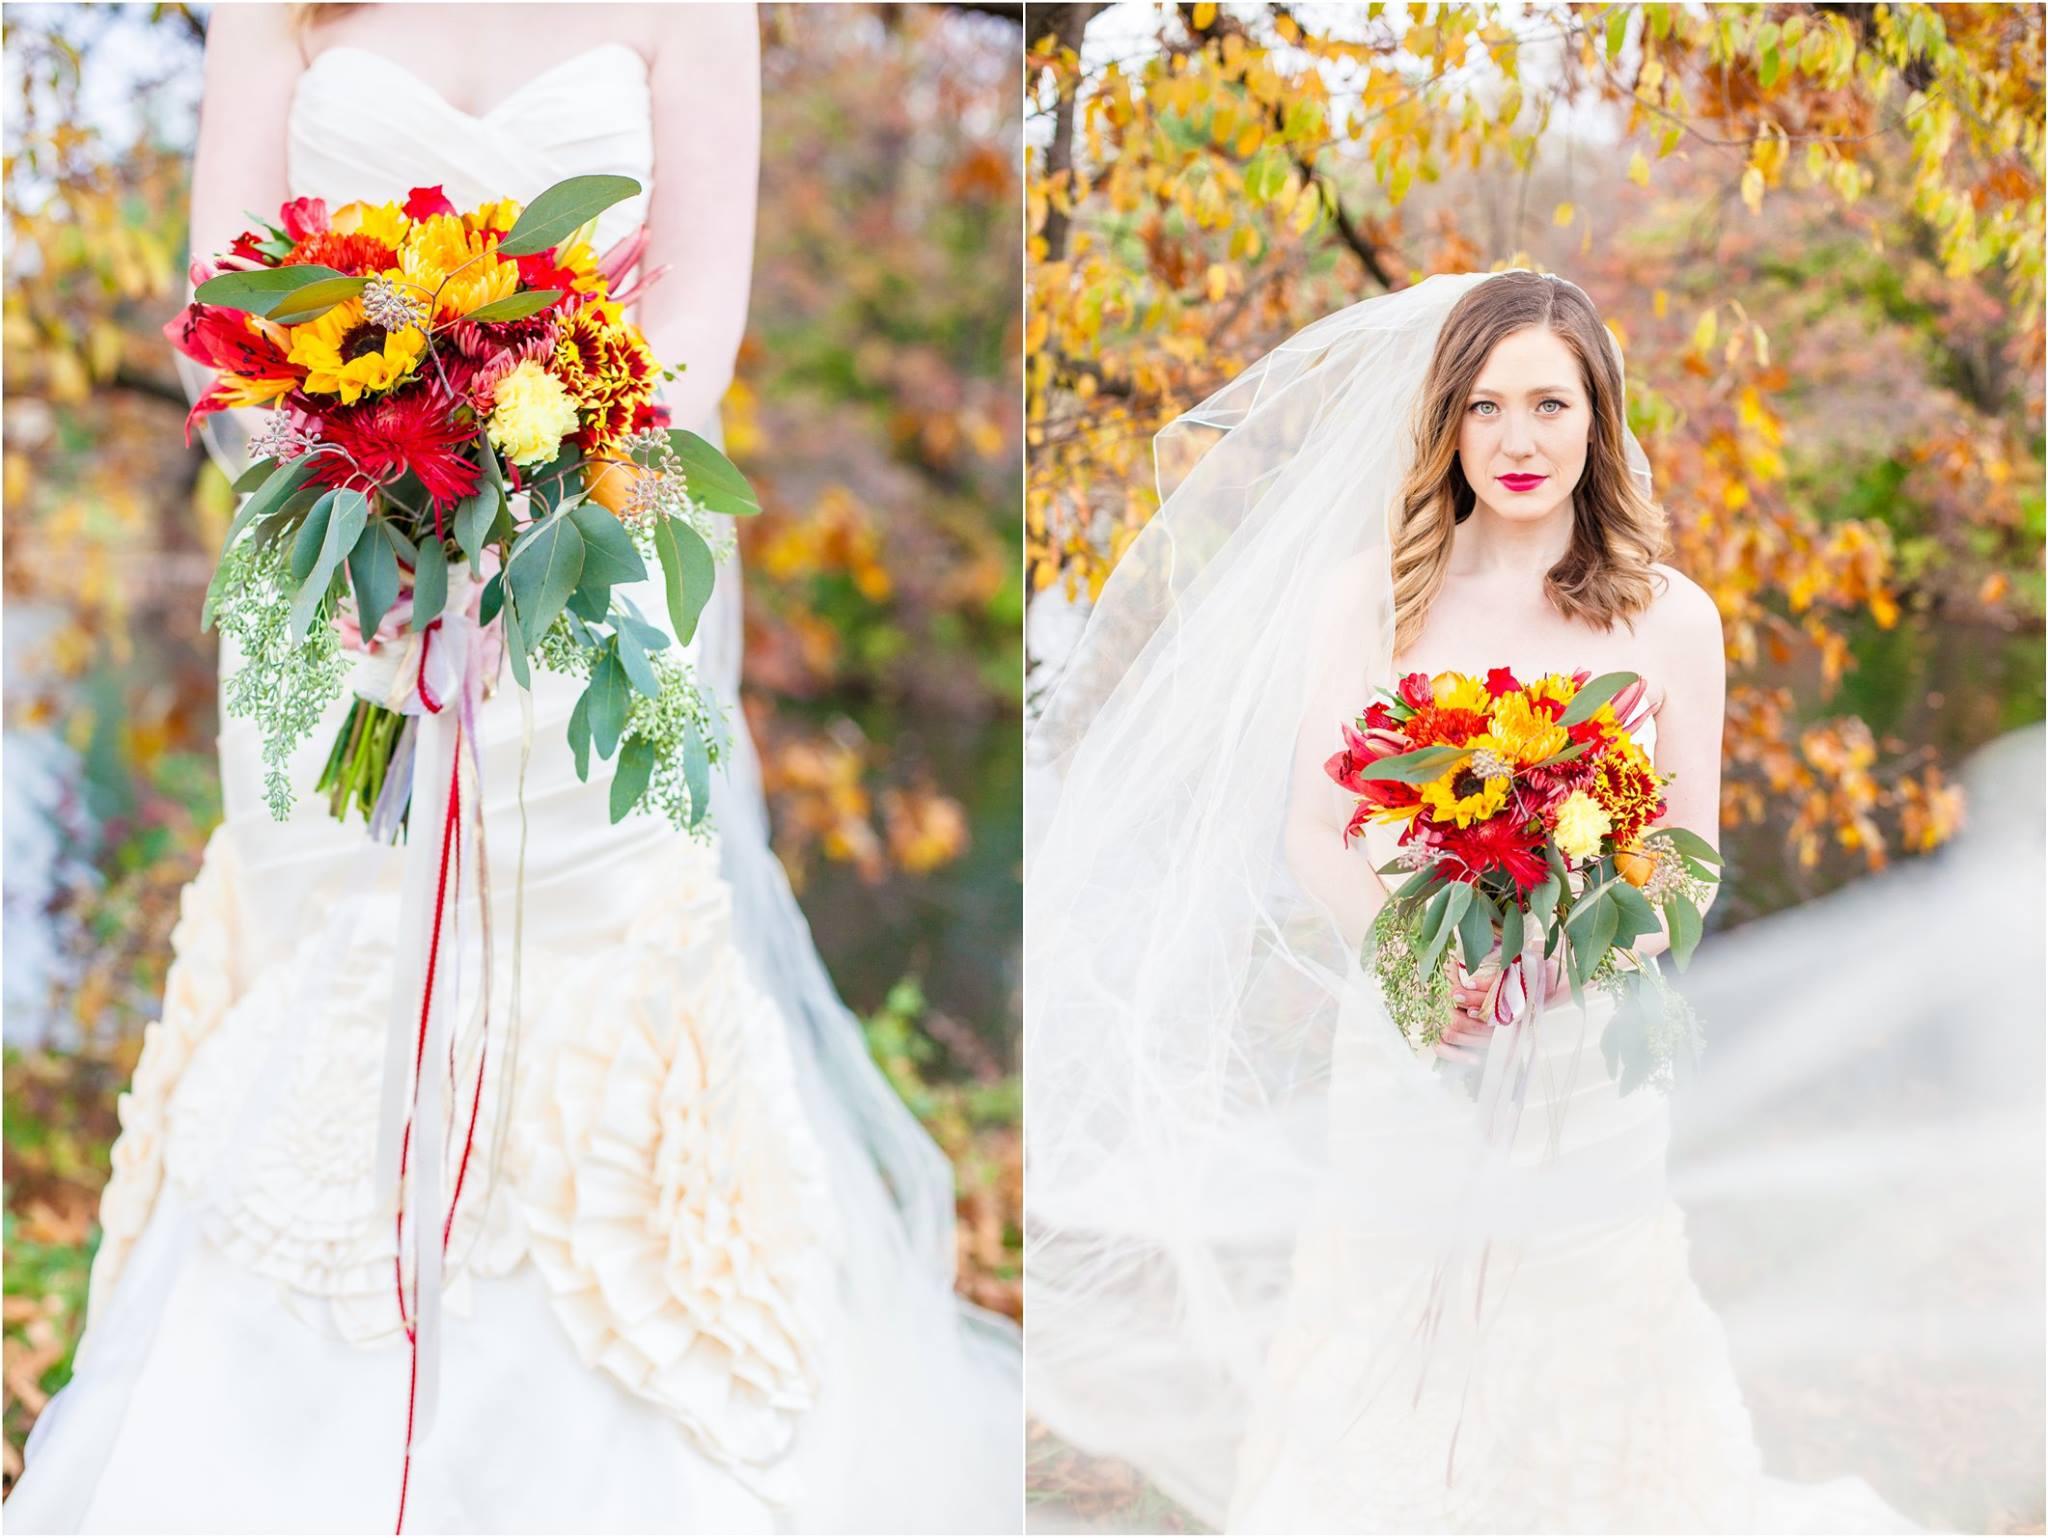 ACStudio_Styled_Autumn-Bride (22).jpg